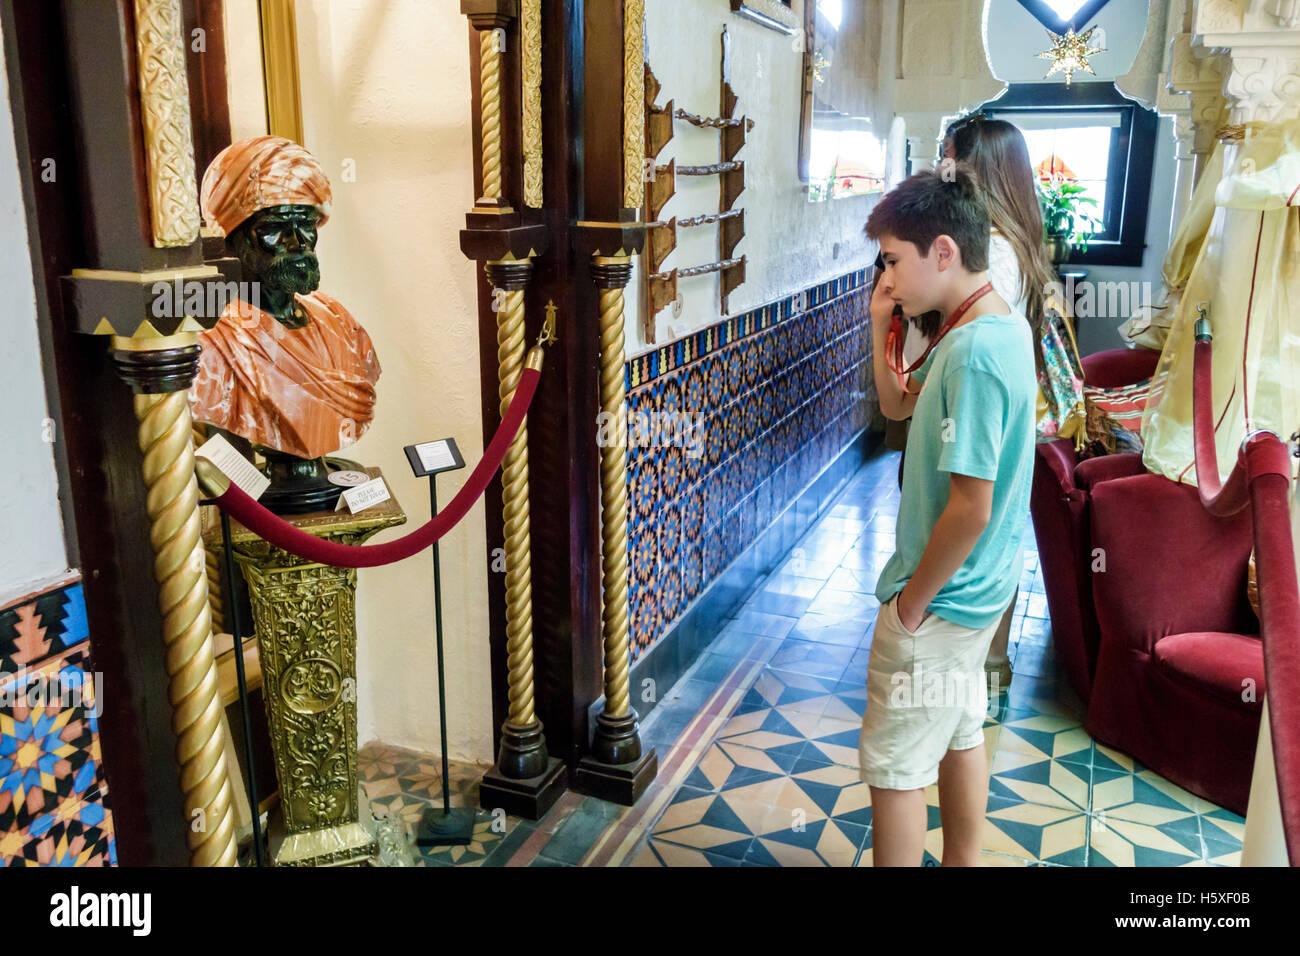 St. Saint Augustine Florida Villa Zorayda Museum Moorish Revival inside collection teen boy listening audio guide - Stock Image